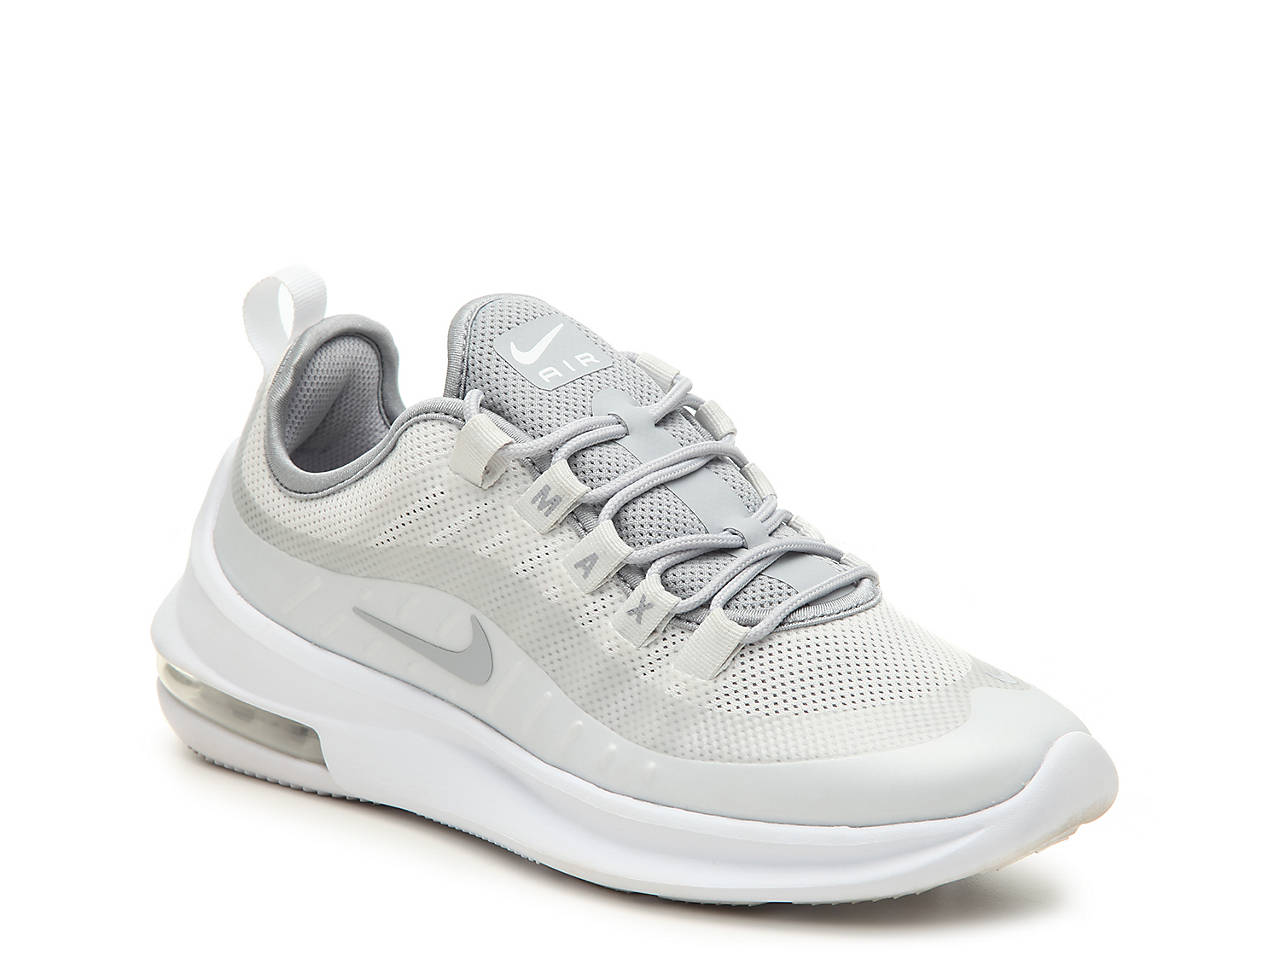 best website 0537f e3fa7 Nike. Air Max Axis Sneaker ...